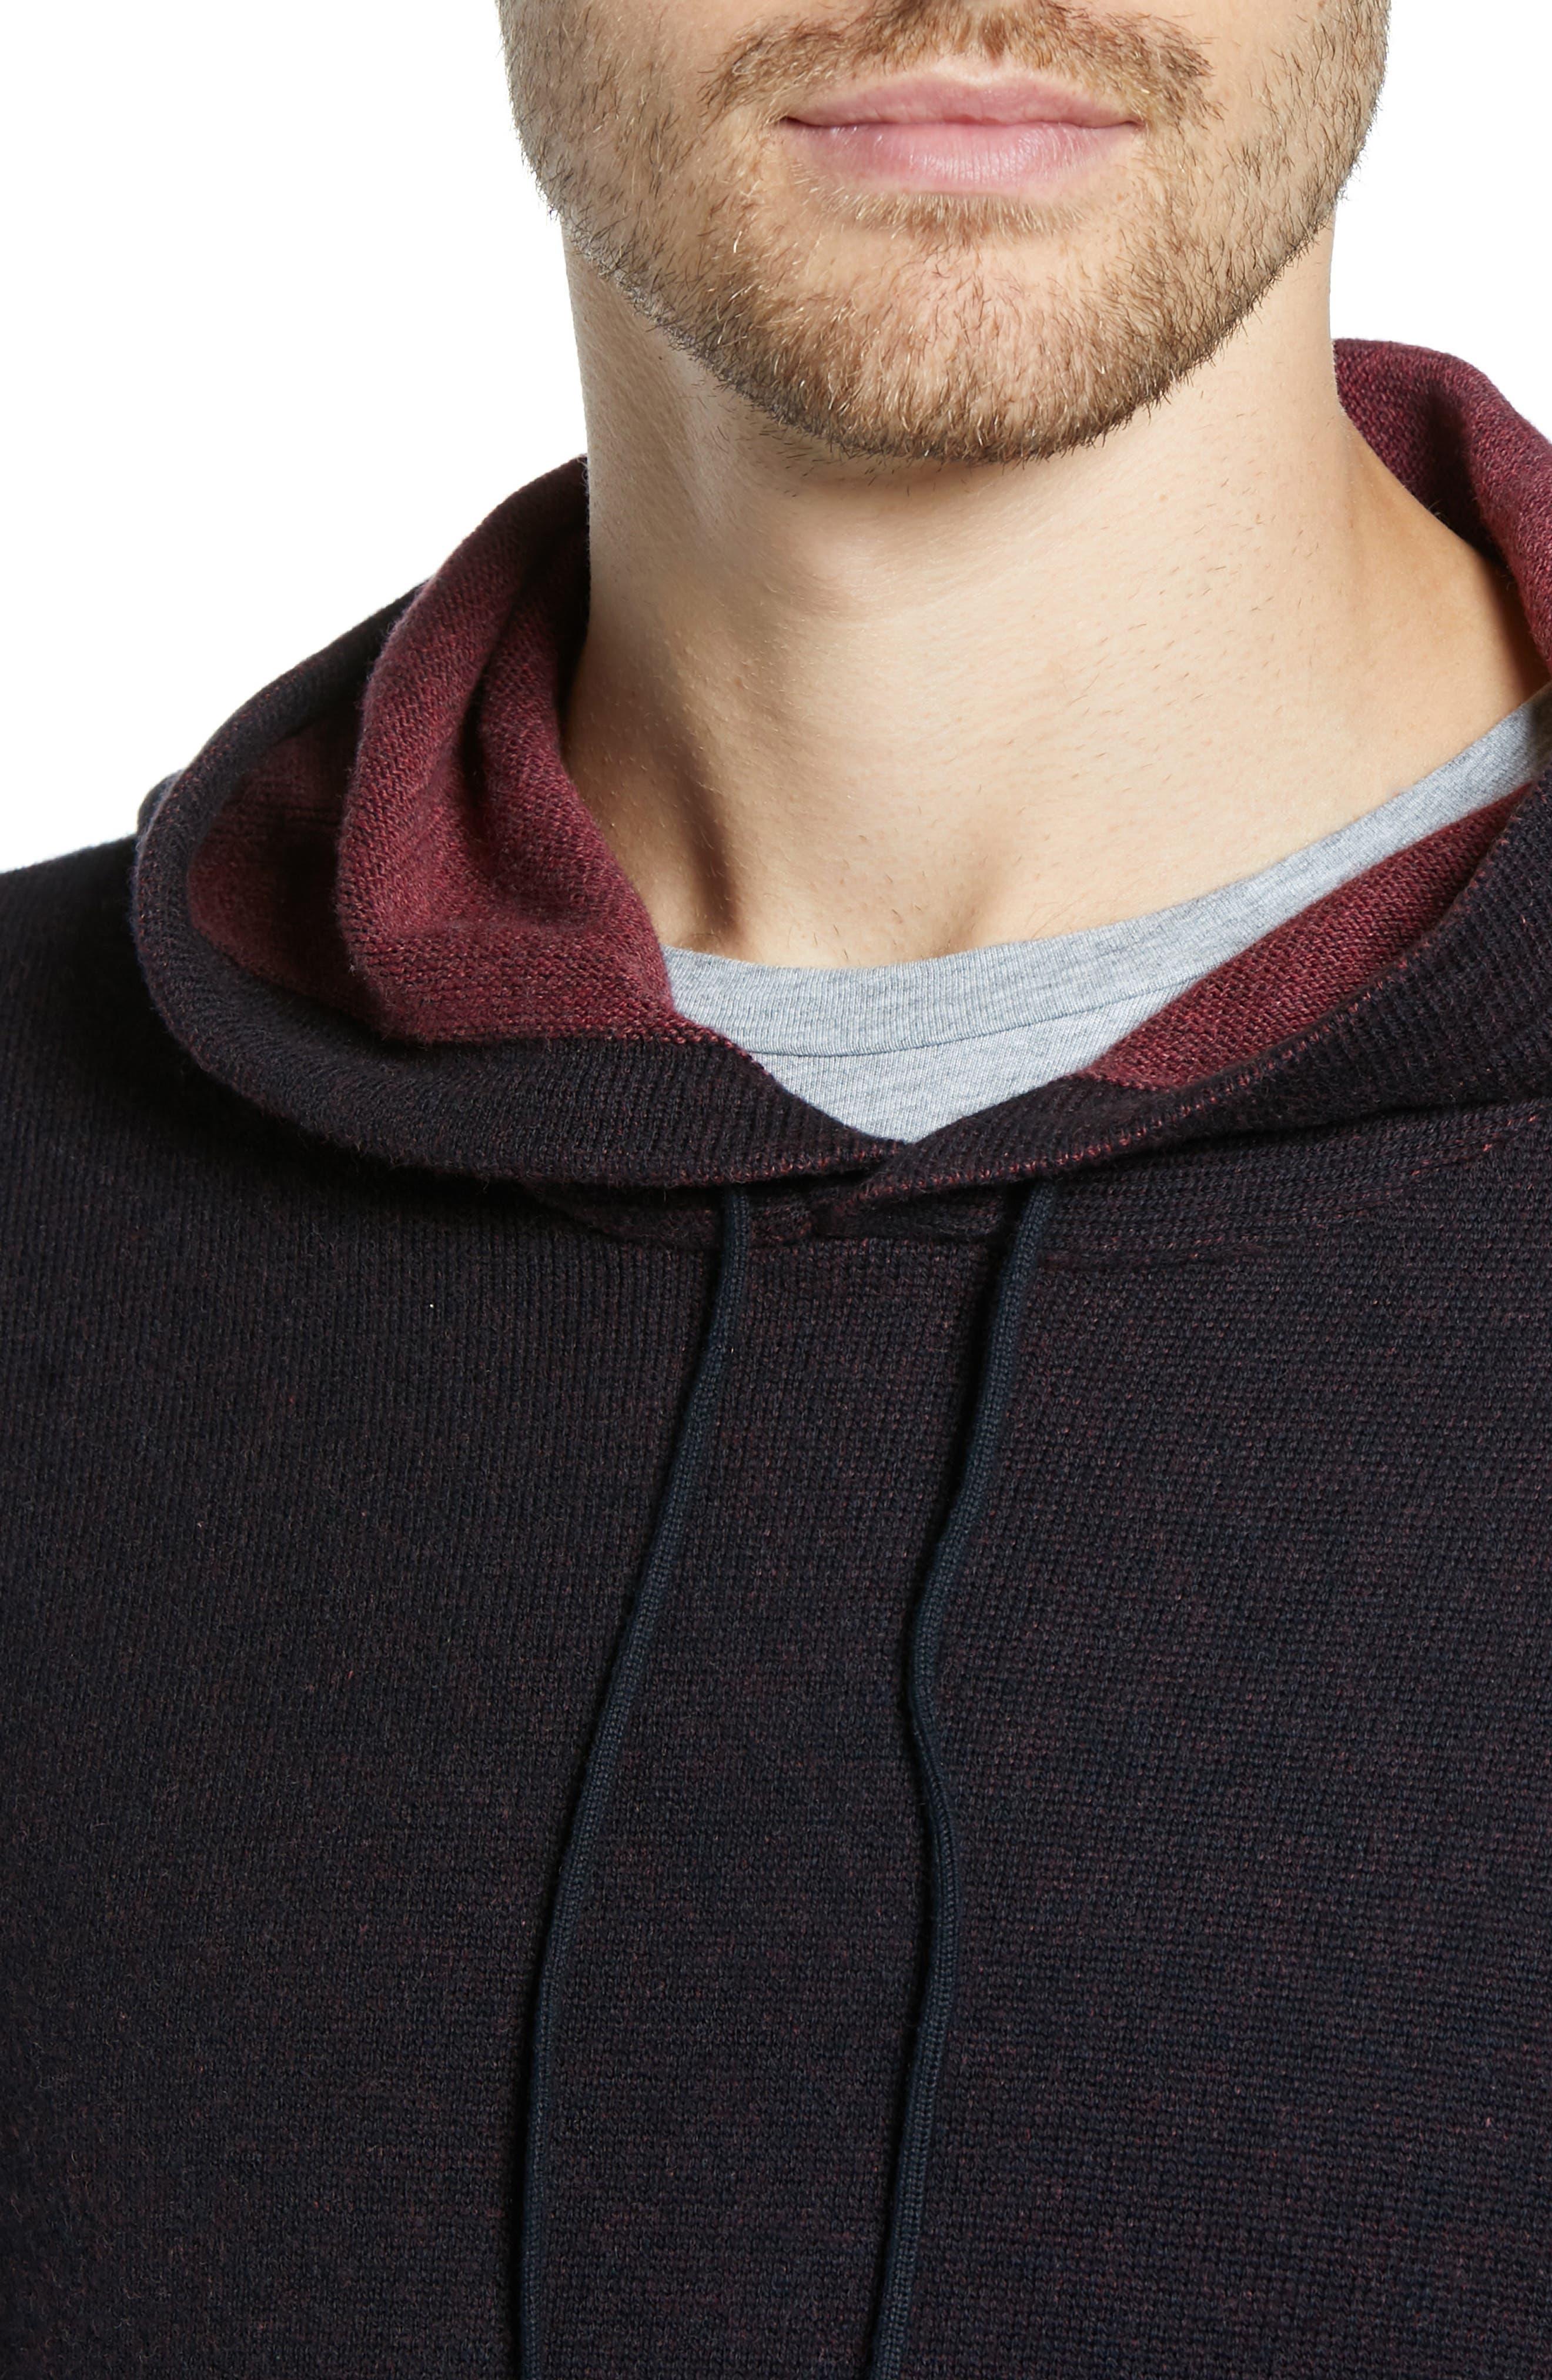 Regular Fit Cotton & Cashmere Hoodie,                             Alternate thumbnail 4, color,                             001